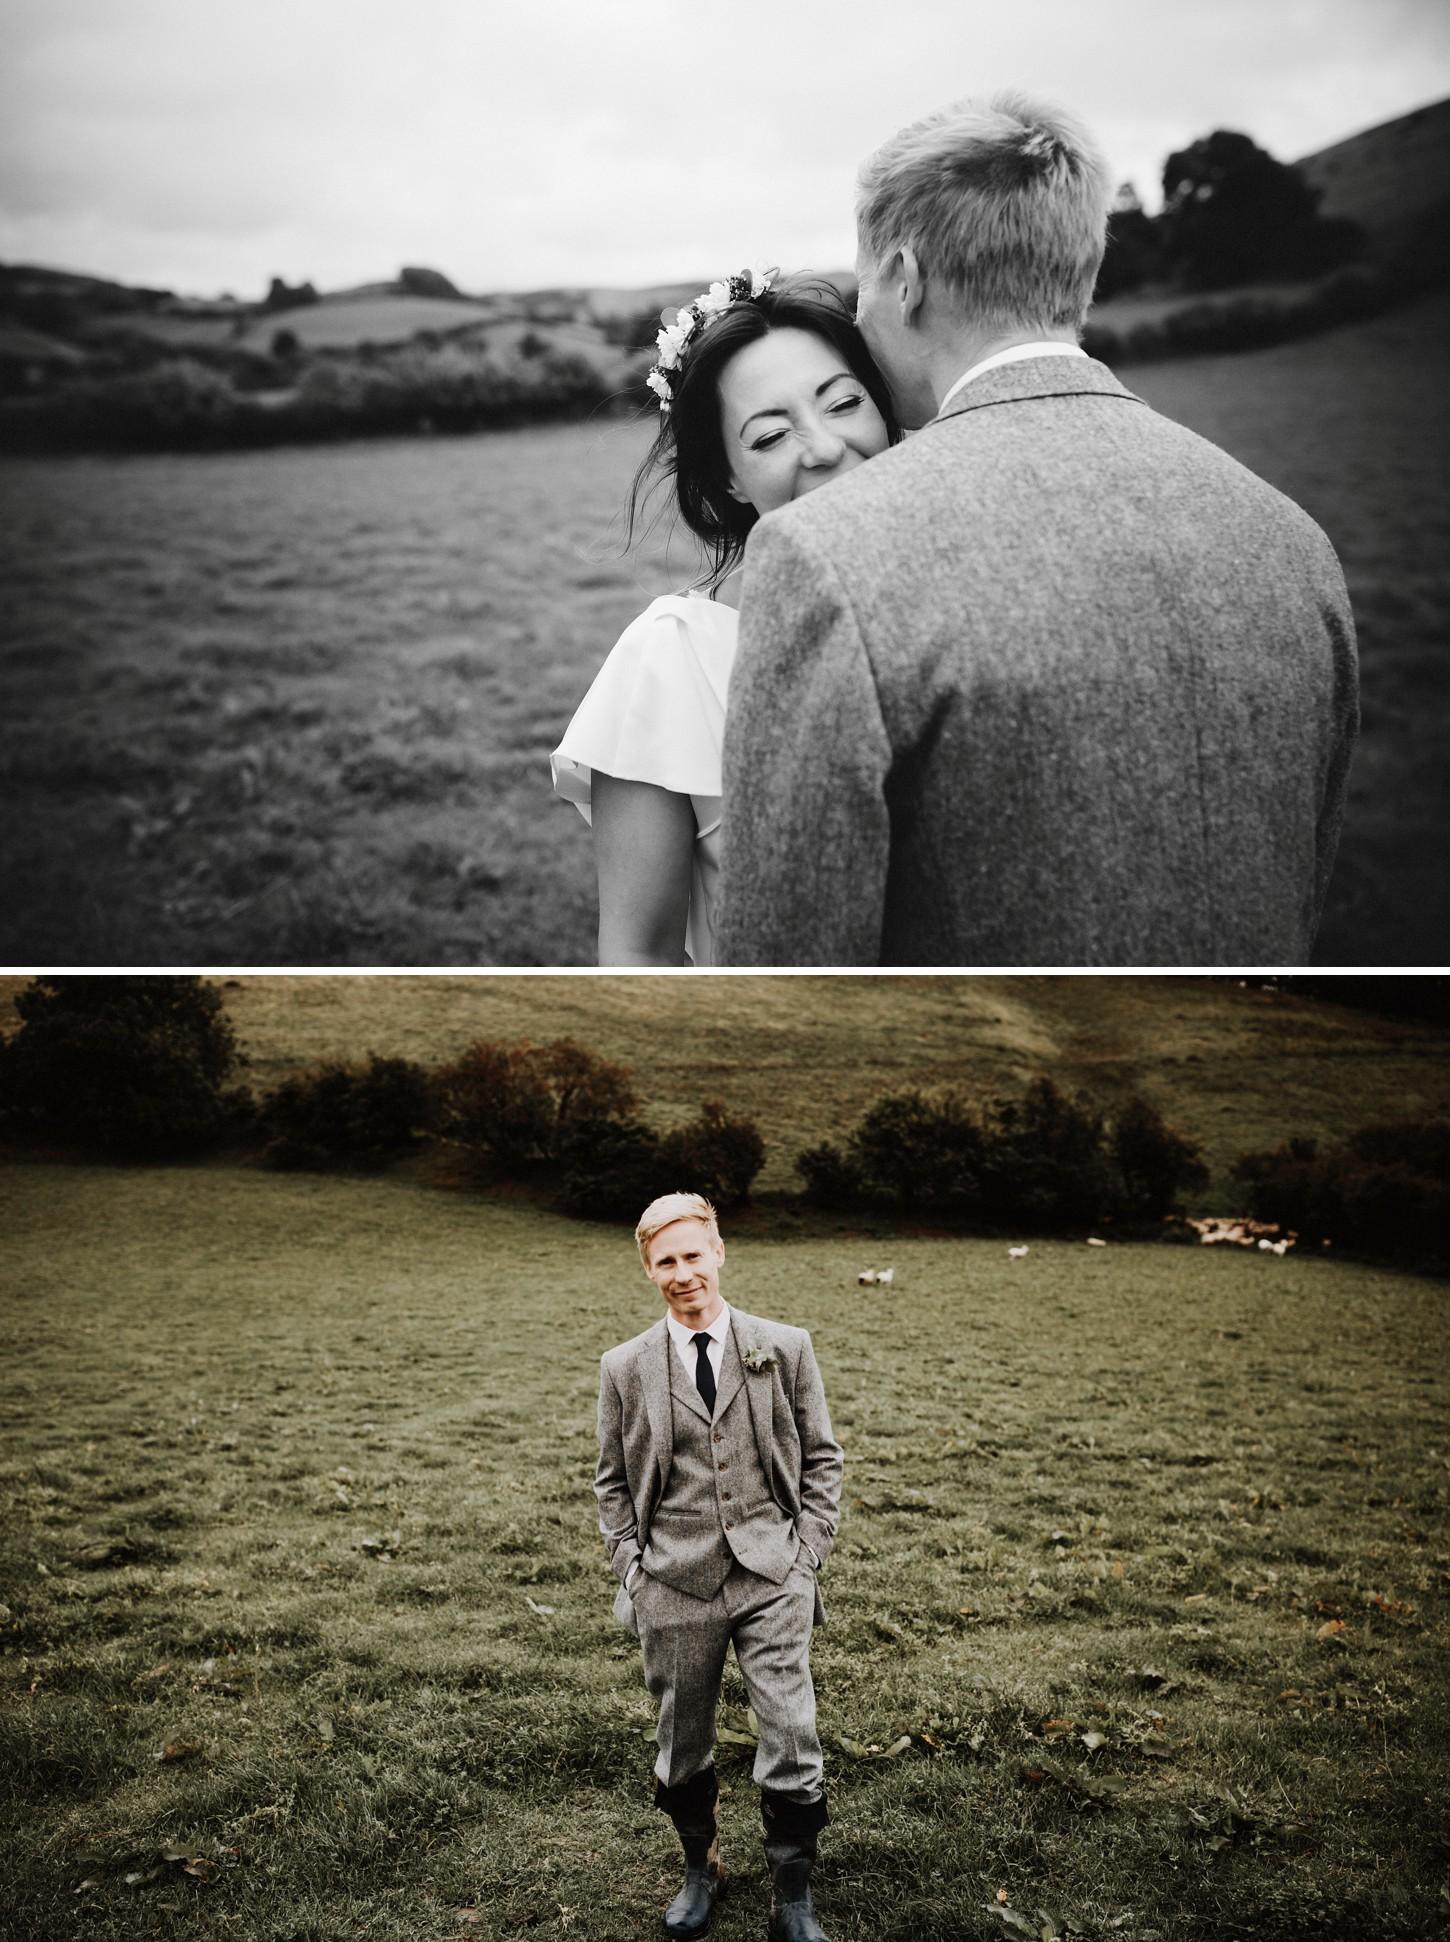 Dolau-Sheep-Farm-Wedding-Wales-United-Kingdom-049